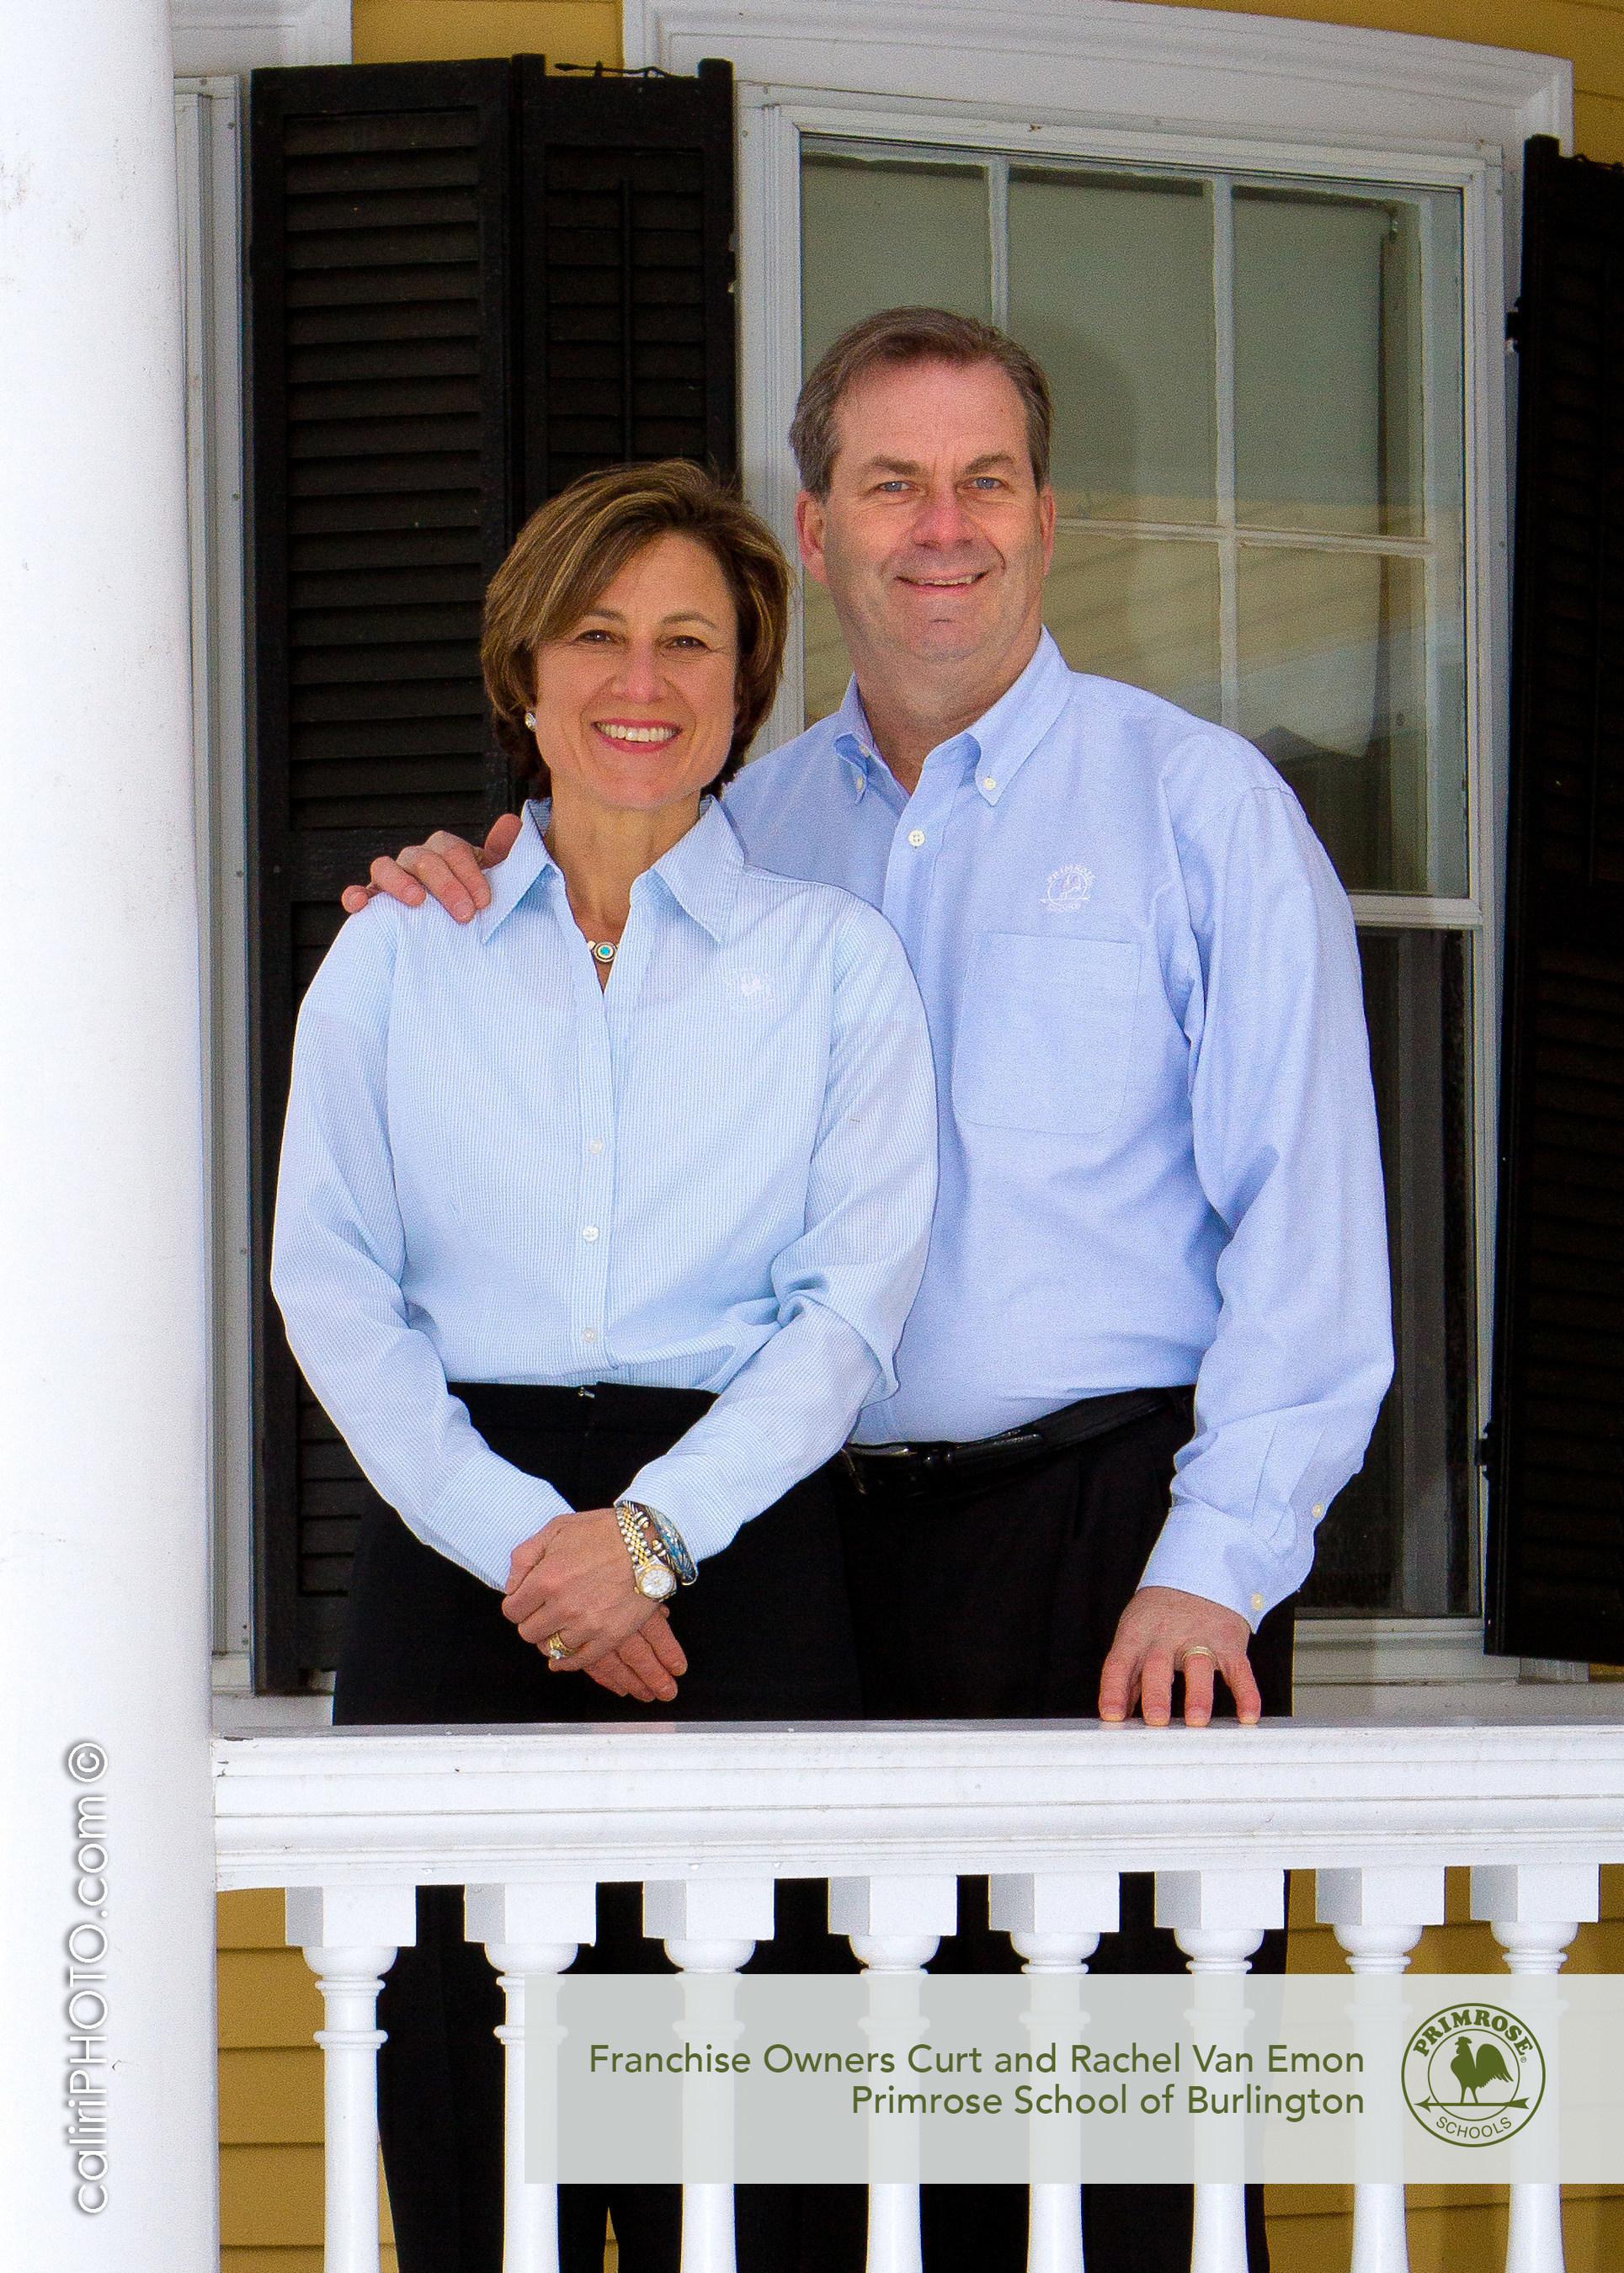 Curt and Rachel Van Emon opened Primrose School of Burlington, the first Primrose school in Massachusetts. Curt will be speaking alongside VP of Franchising Chris Goethe at the International Franchise Expo.